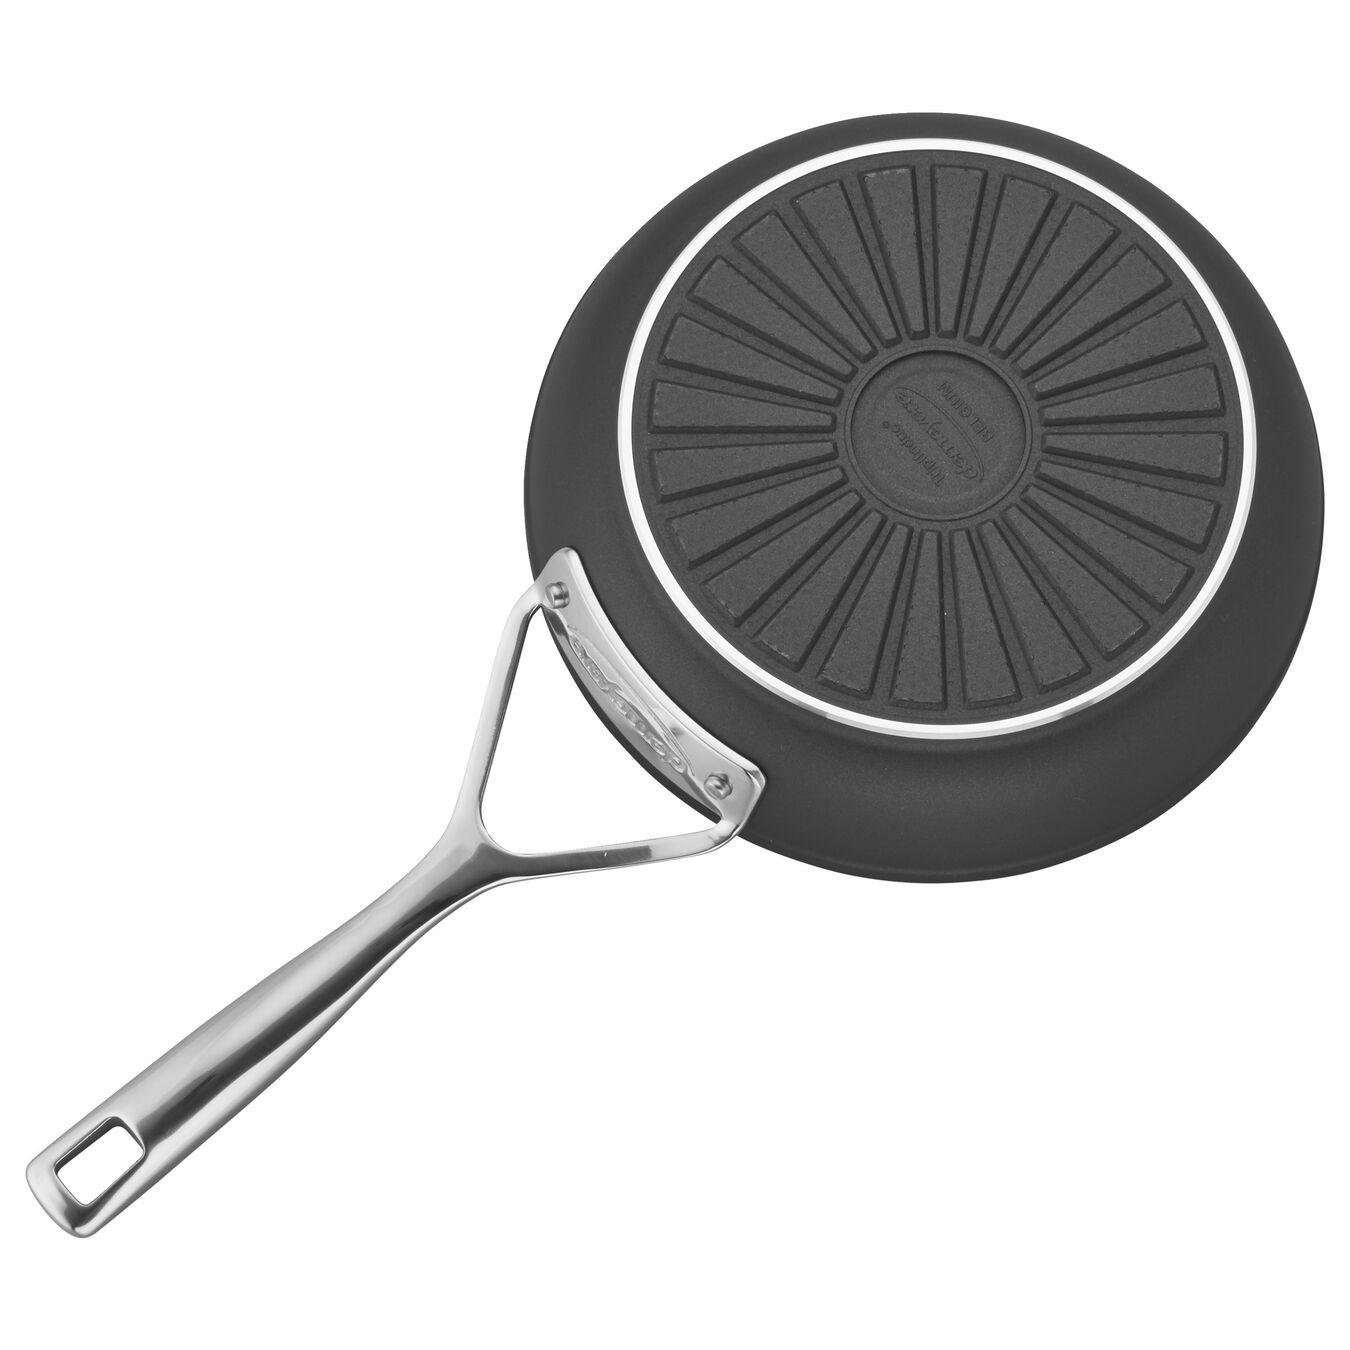 8-inch Aluminum Nonstick Fry Pan,,large 2